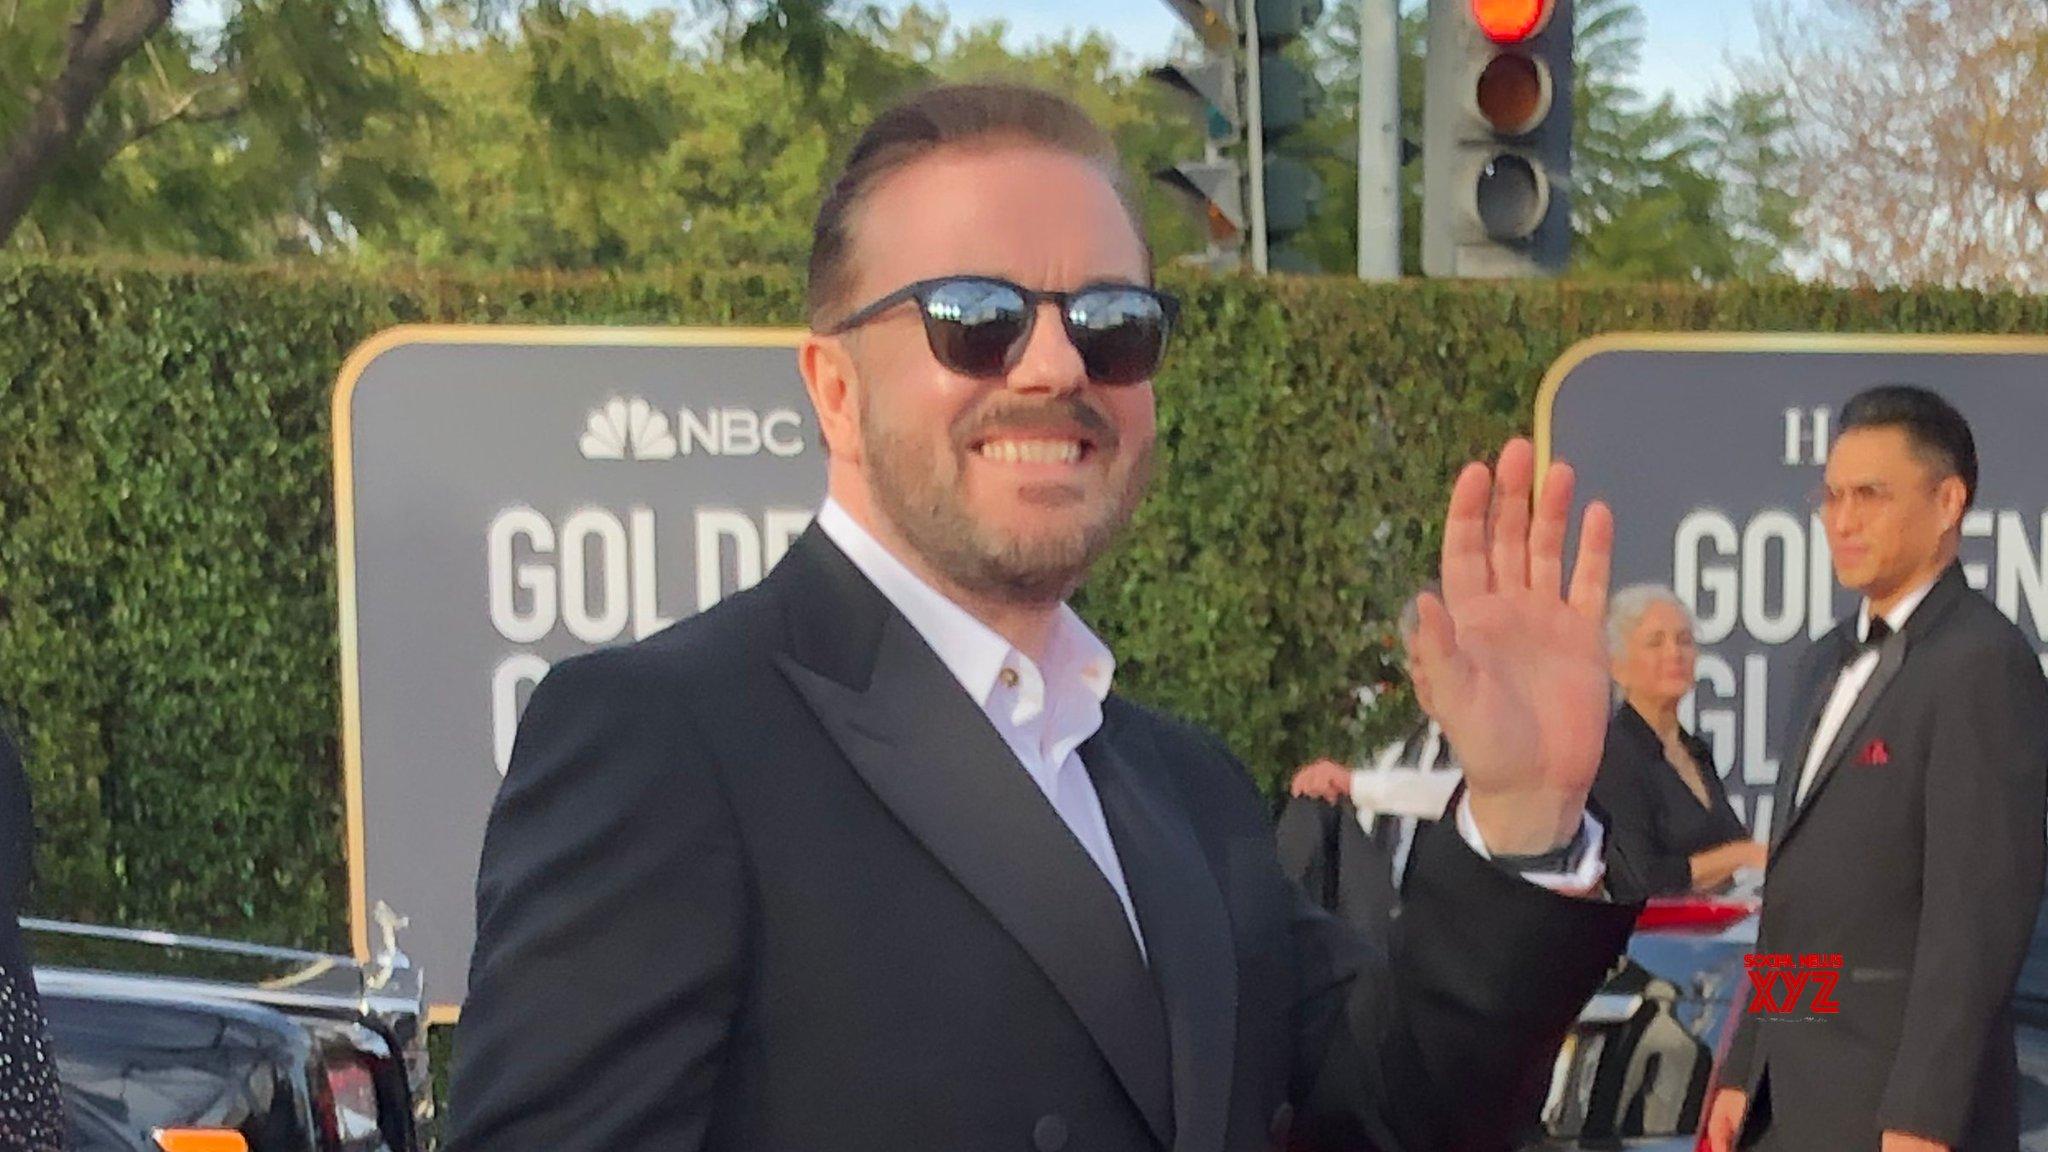 Zoey Deutch Ana De Armas Ricky Gervais Kyle Chandler And